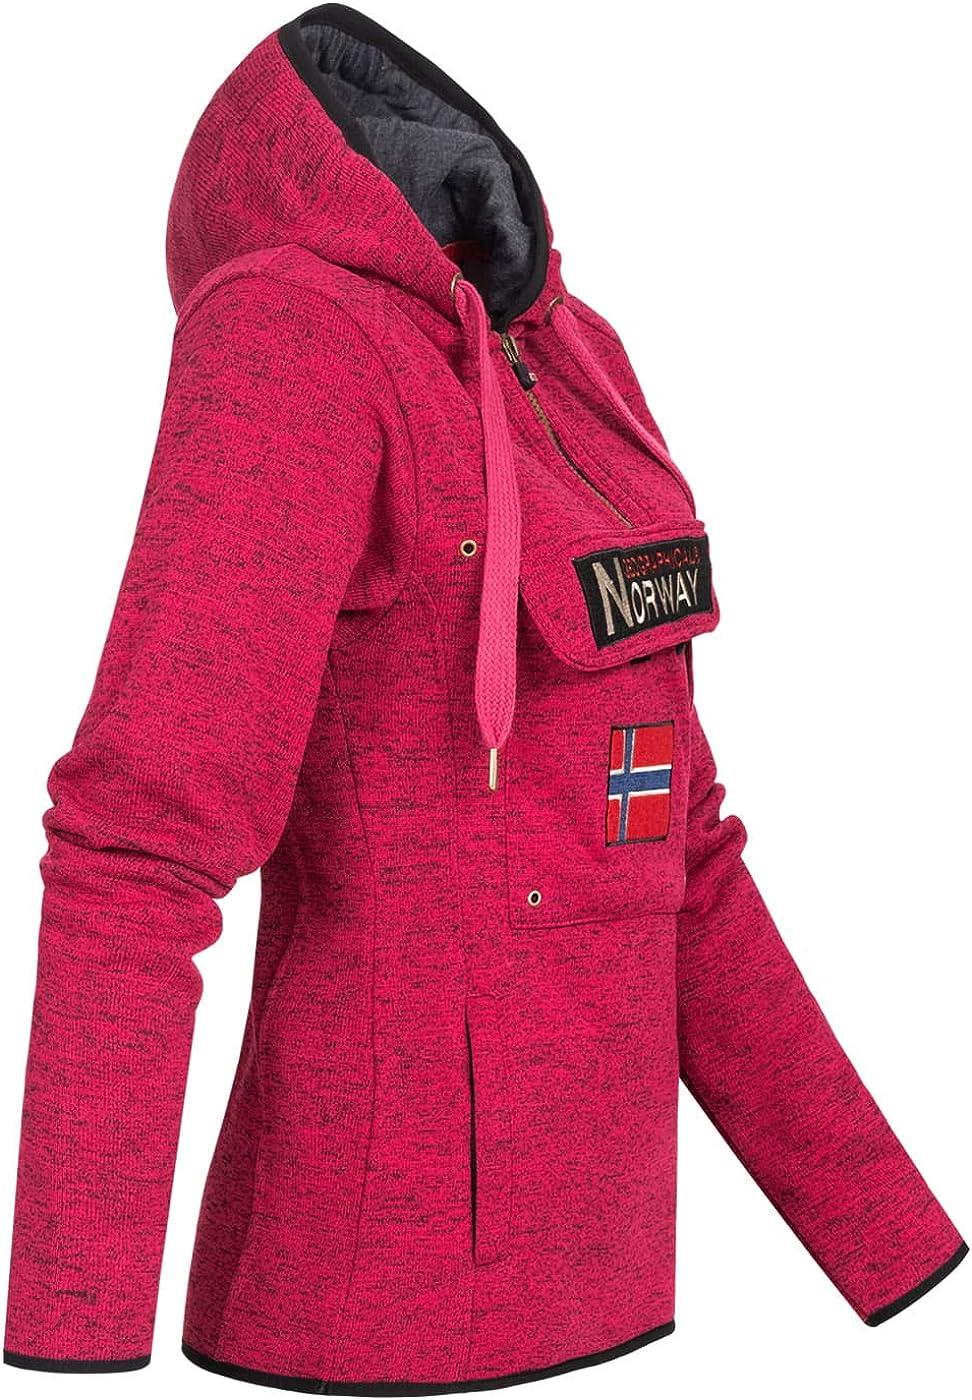 Geographical Norway Damen Half Zip Hoodie Kapuzenpullover Sweater Brusttasche Embro Känguru Pocket Sleeve Rupper Patch Flash Pink